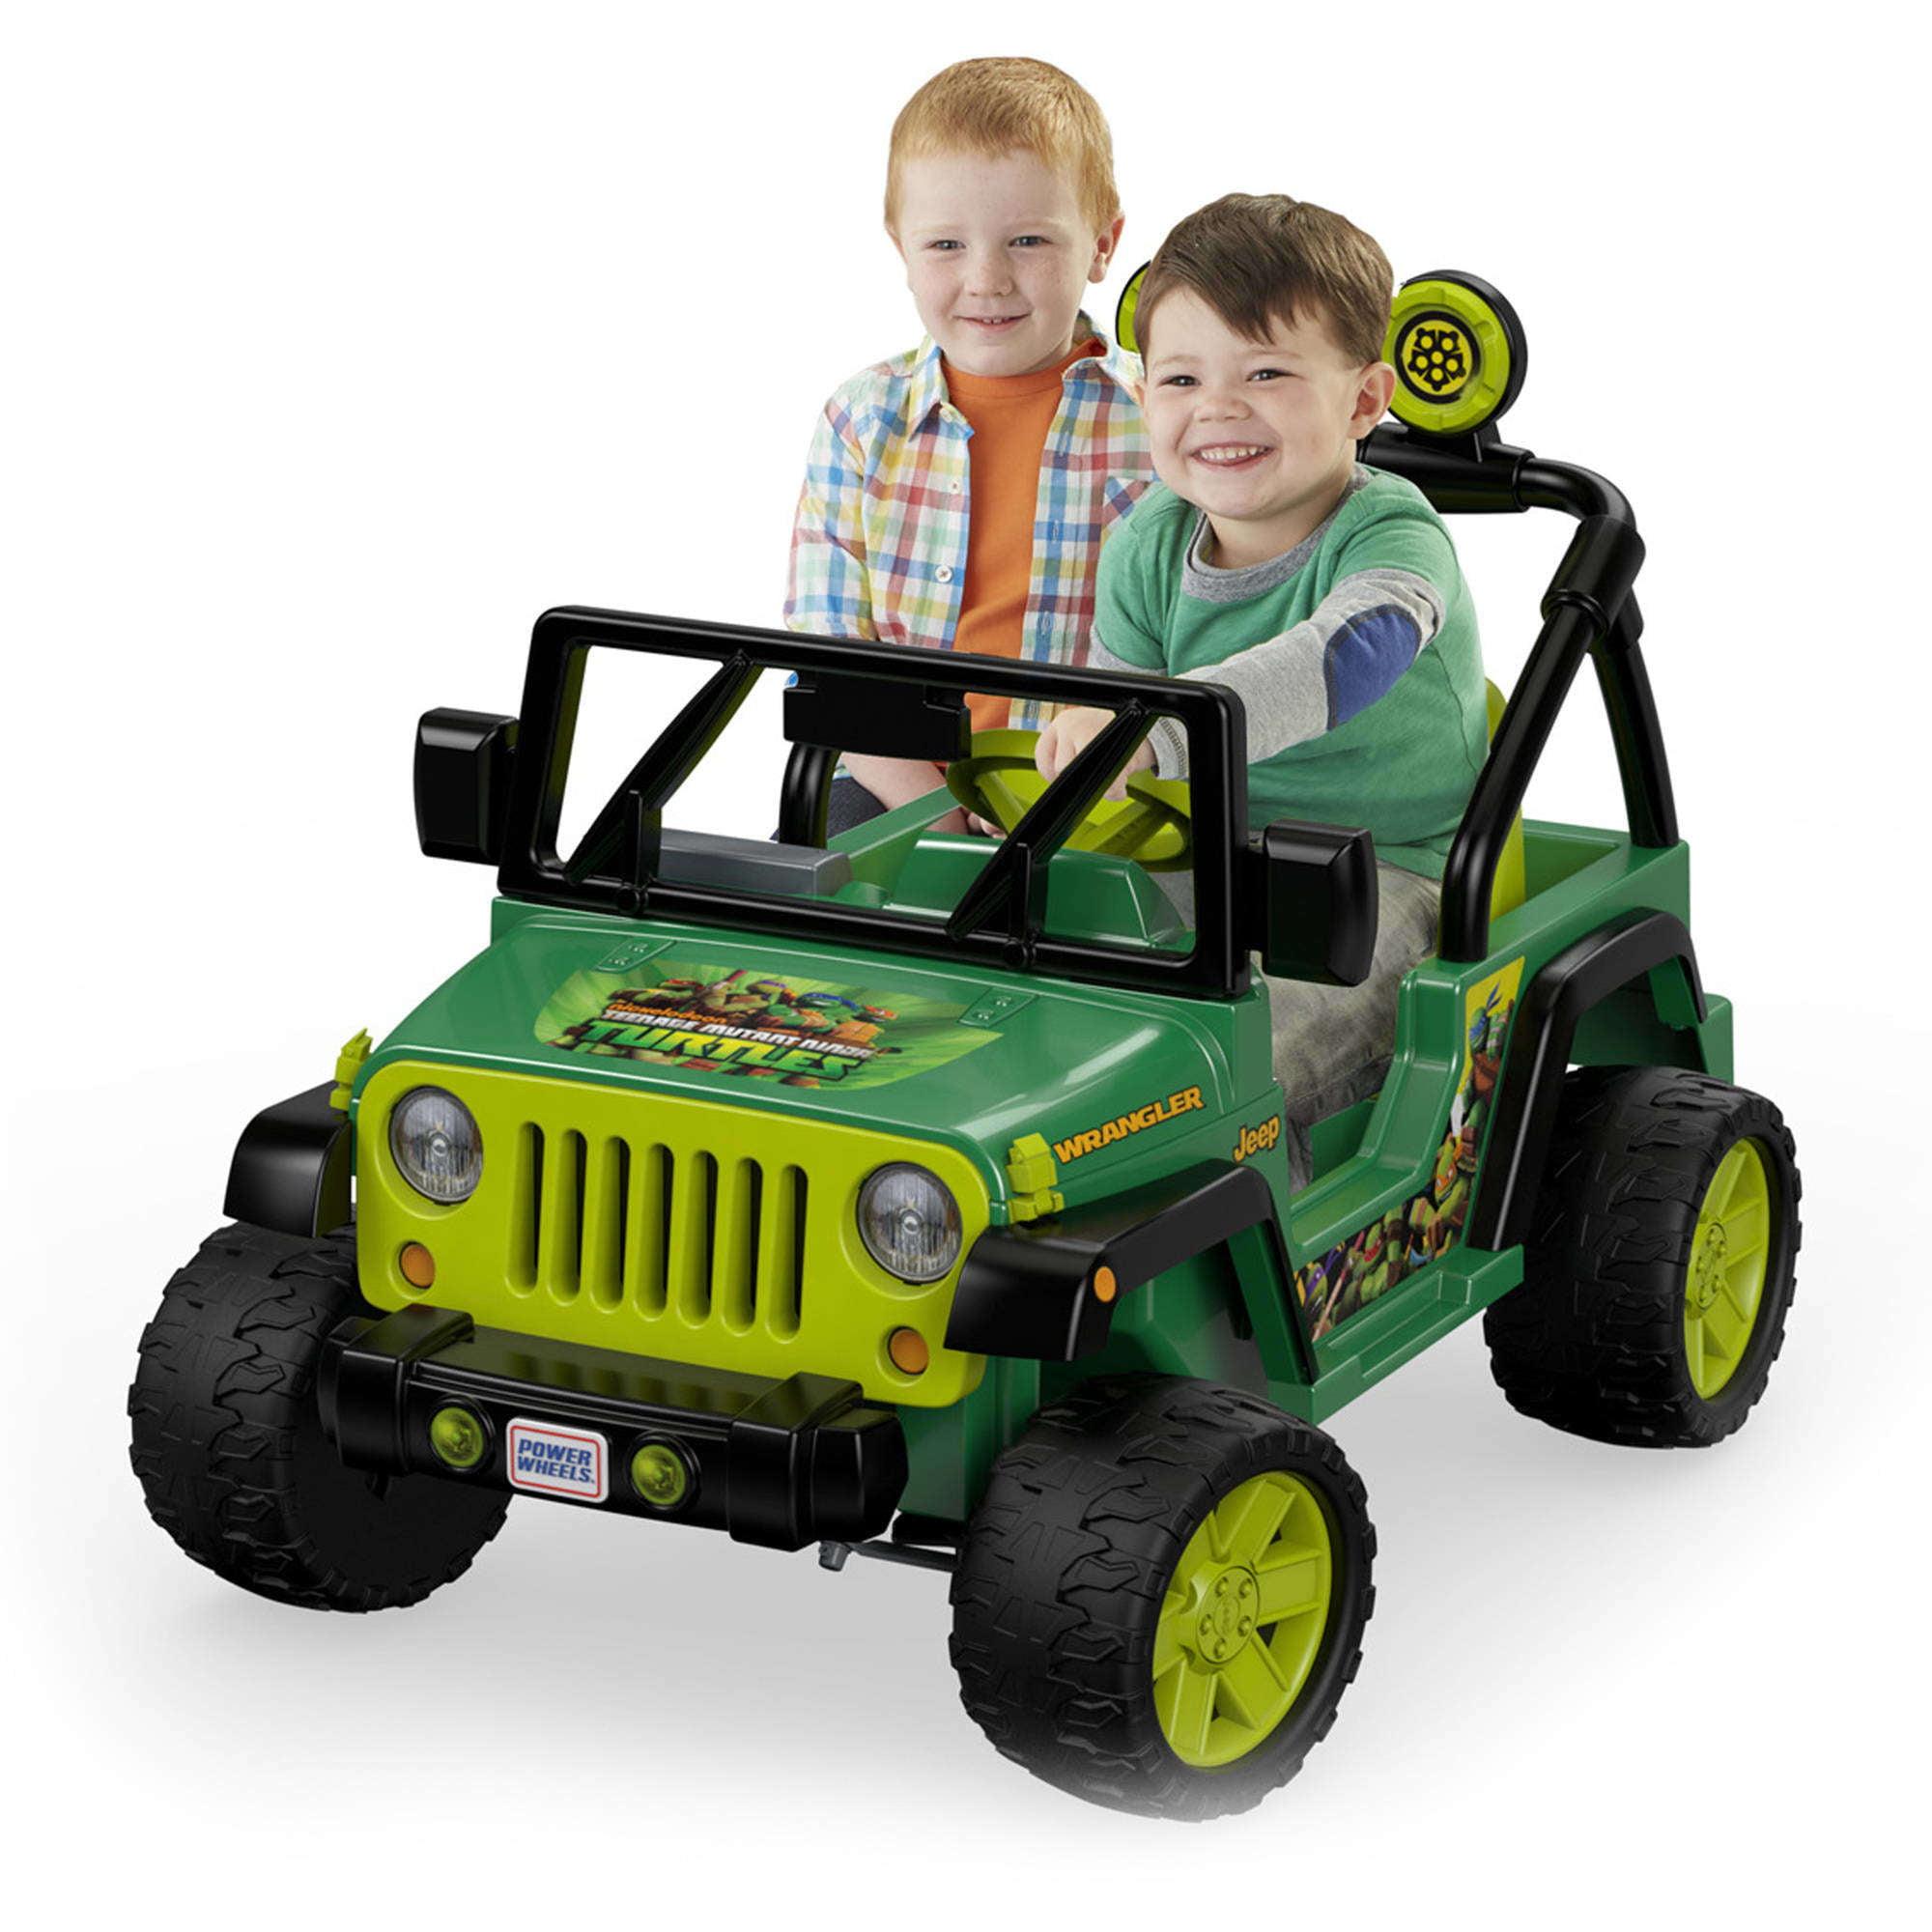 Power Wheels Nickelodeon Teenage Mutant Ninja Turtles Jeep Wrangler 12V Battery-Powered... by FISHER PRICE